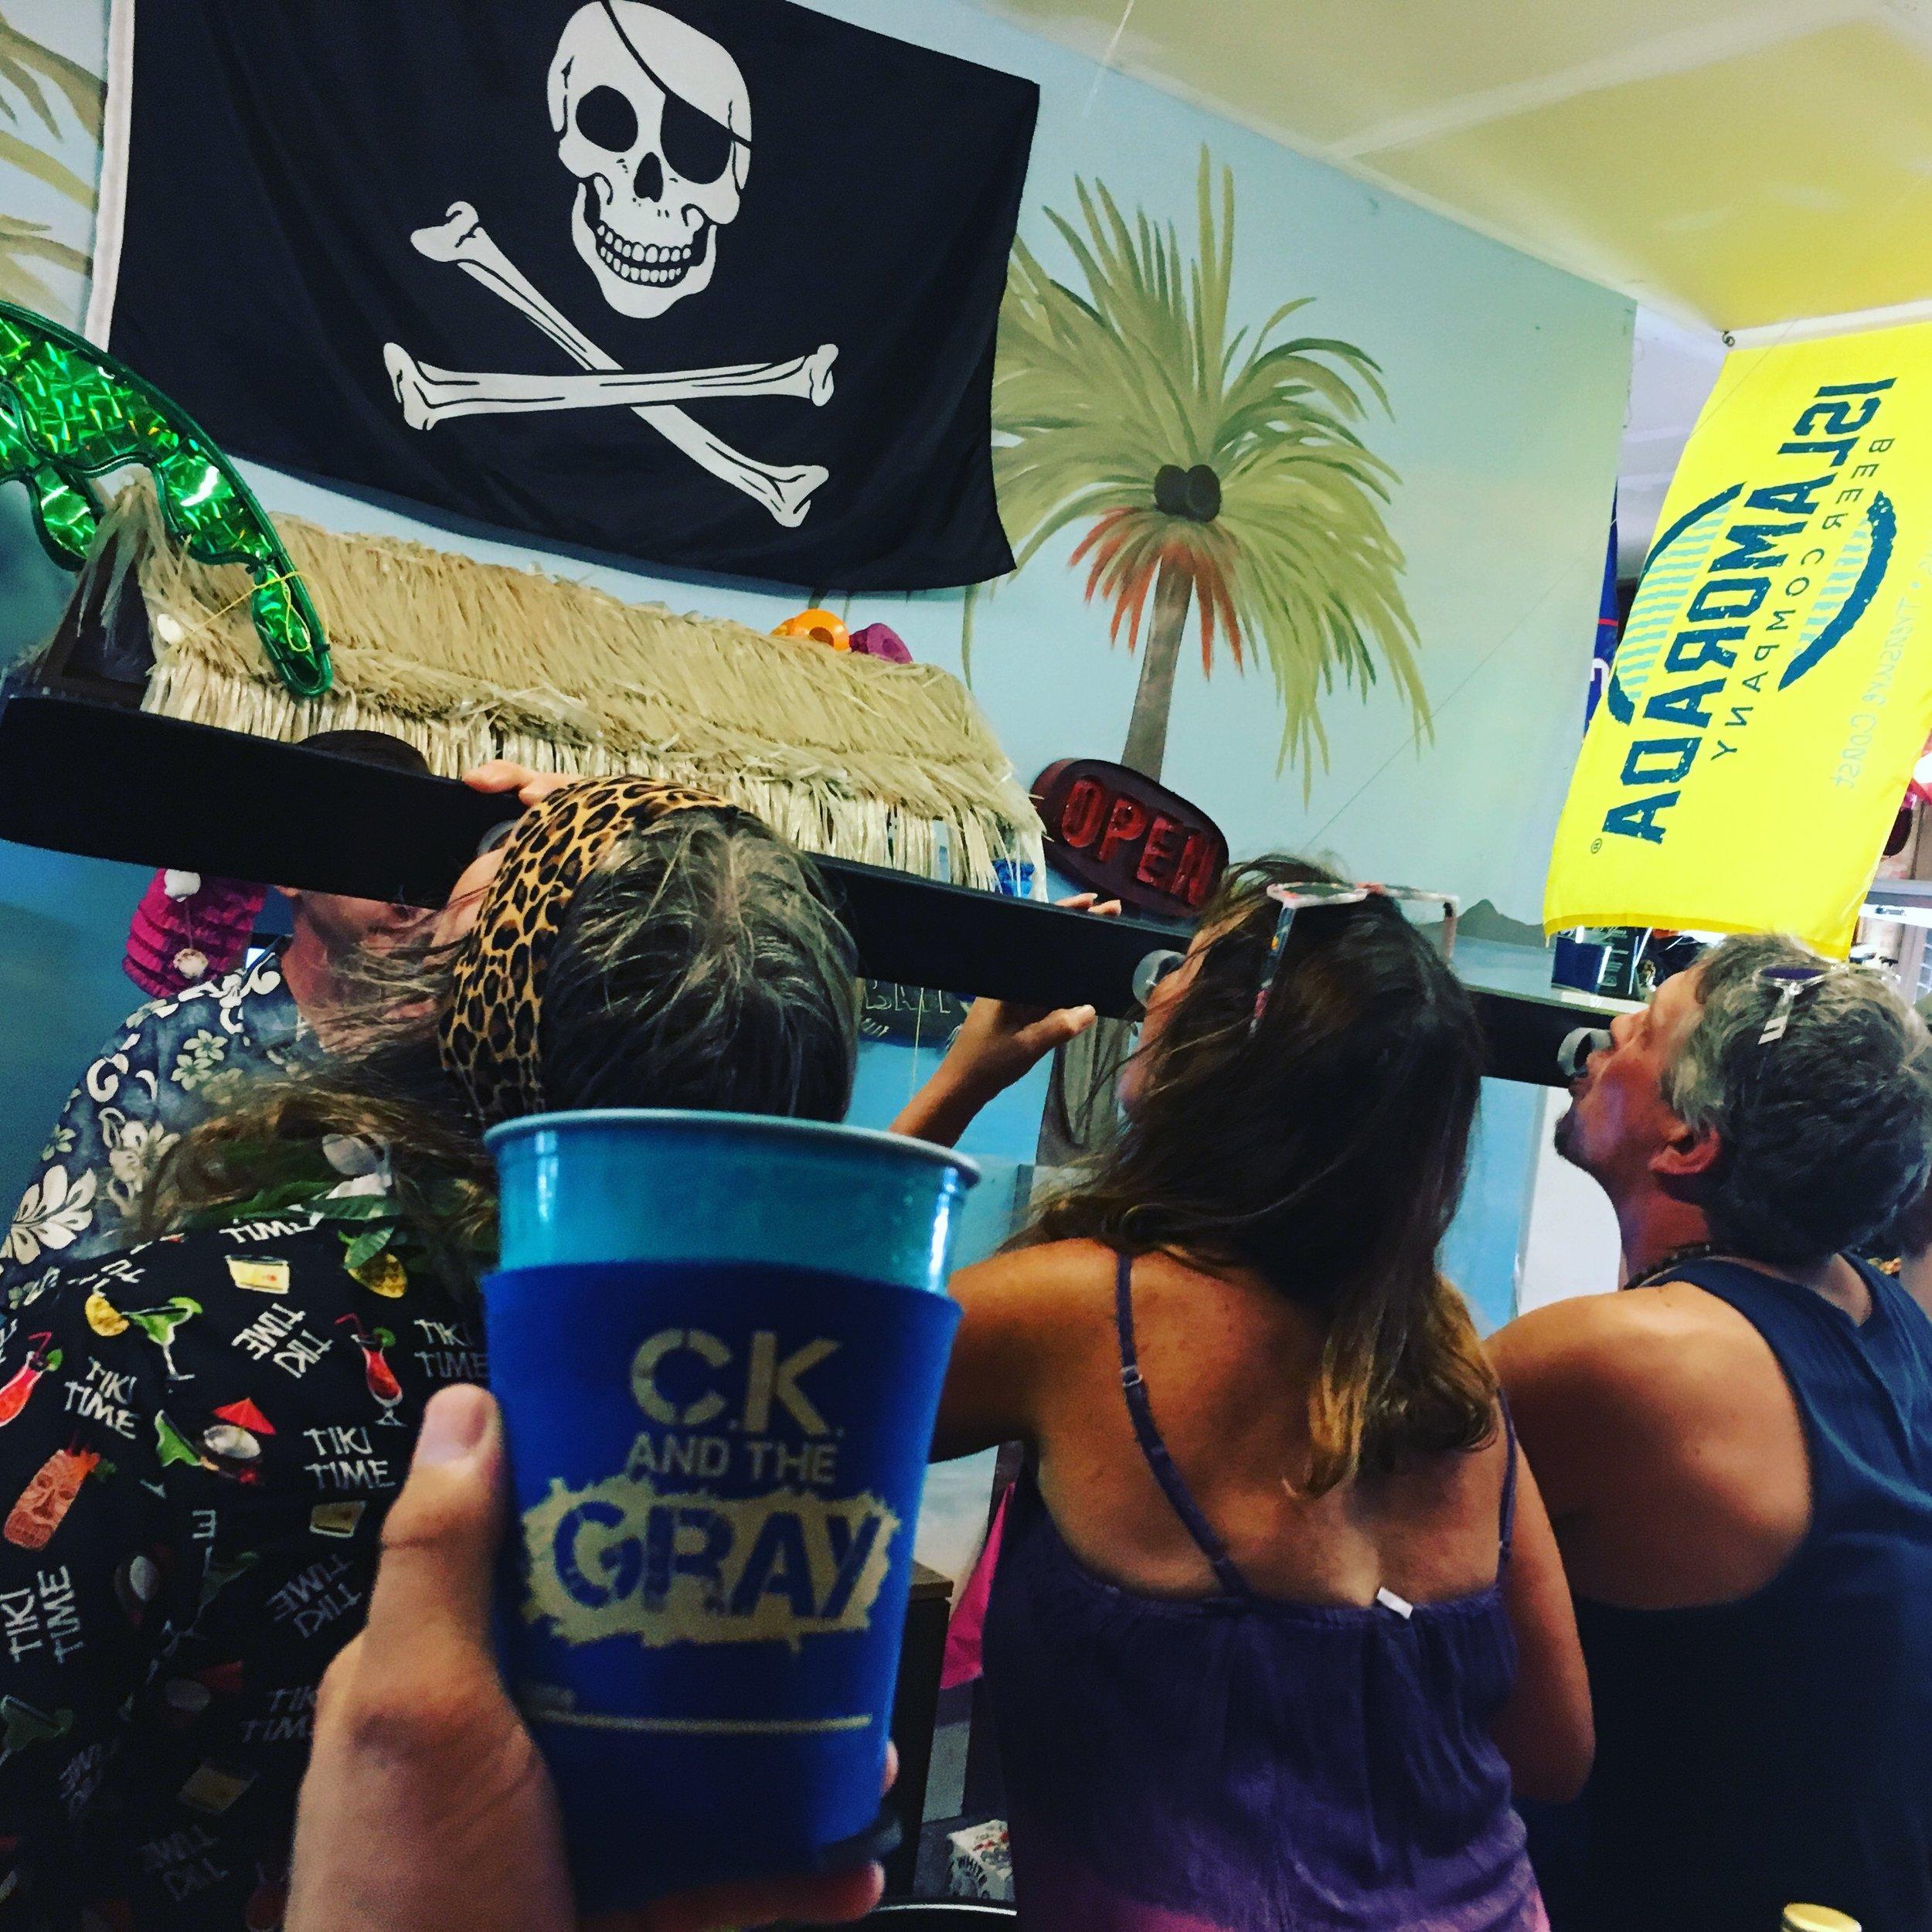 Inaugural first shot of the Shotski at Taki Tiki Party #ckcancooler